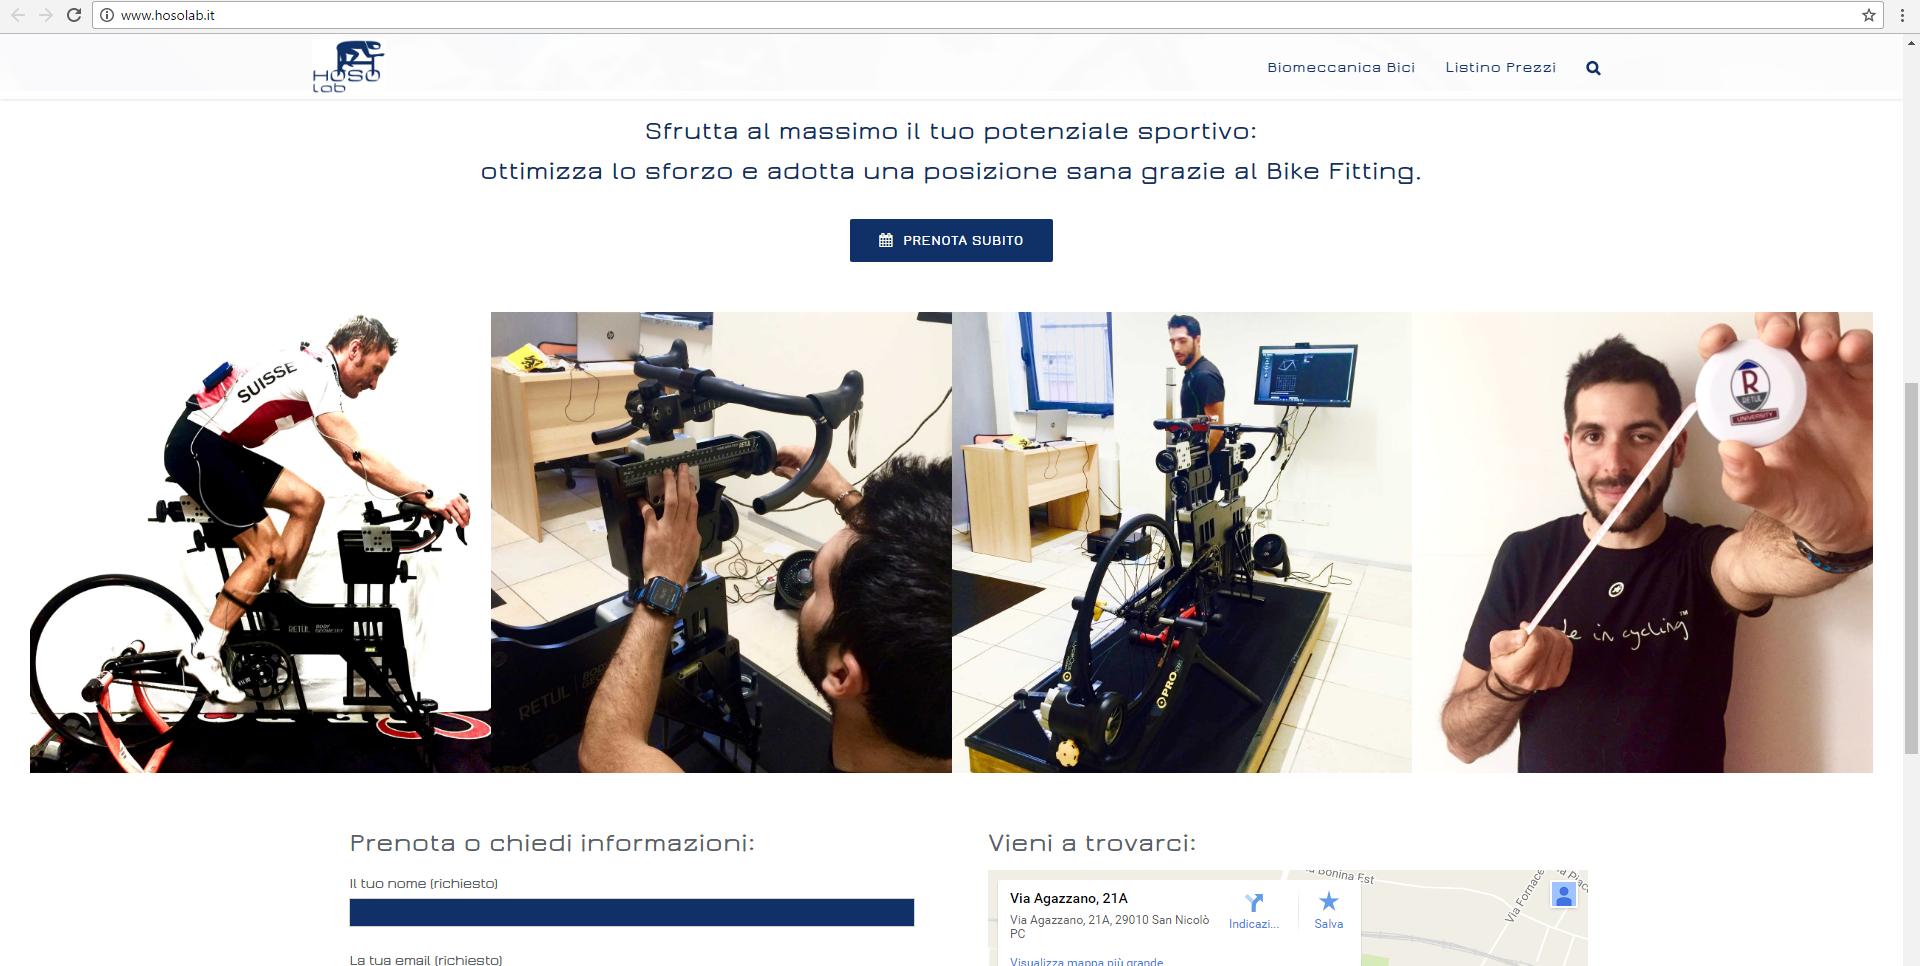 Hoso Lab bike fitting Piacenza Geofelix